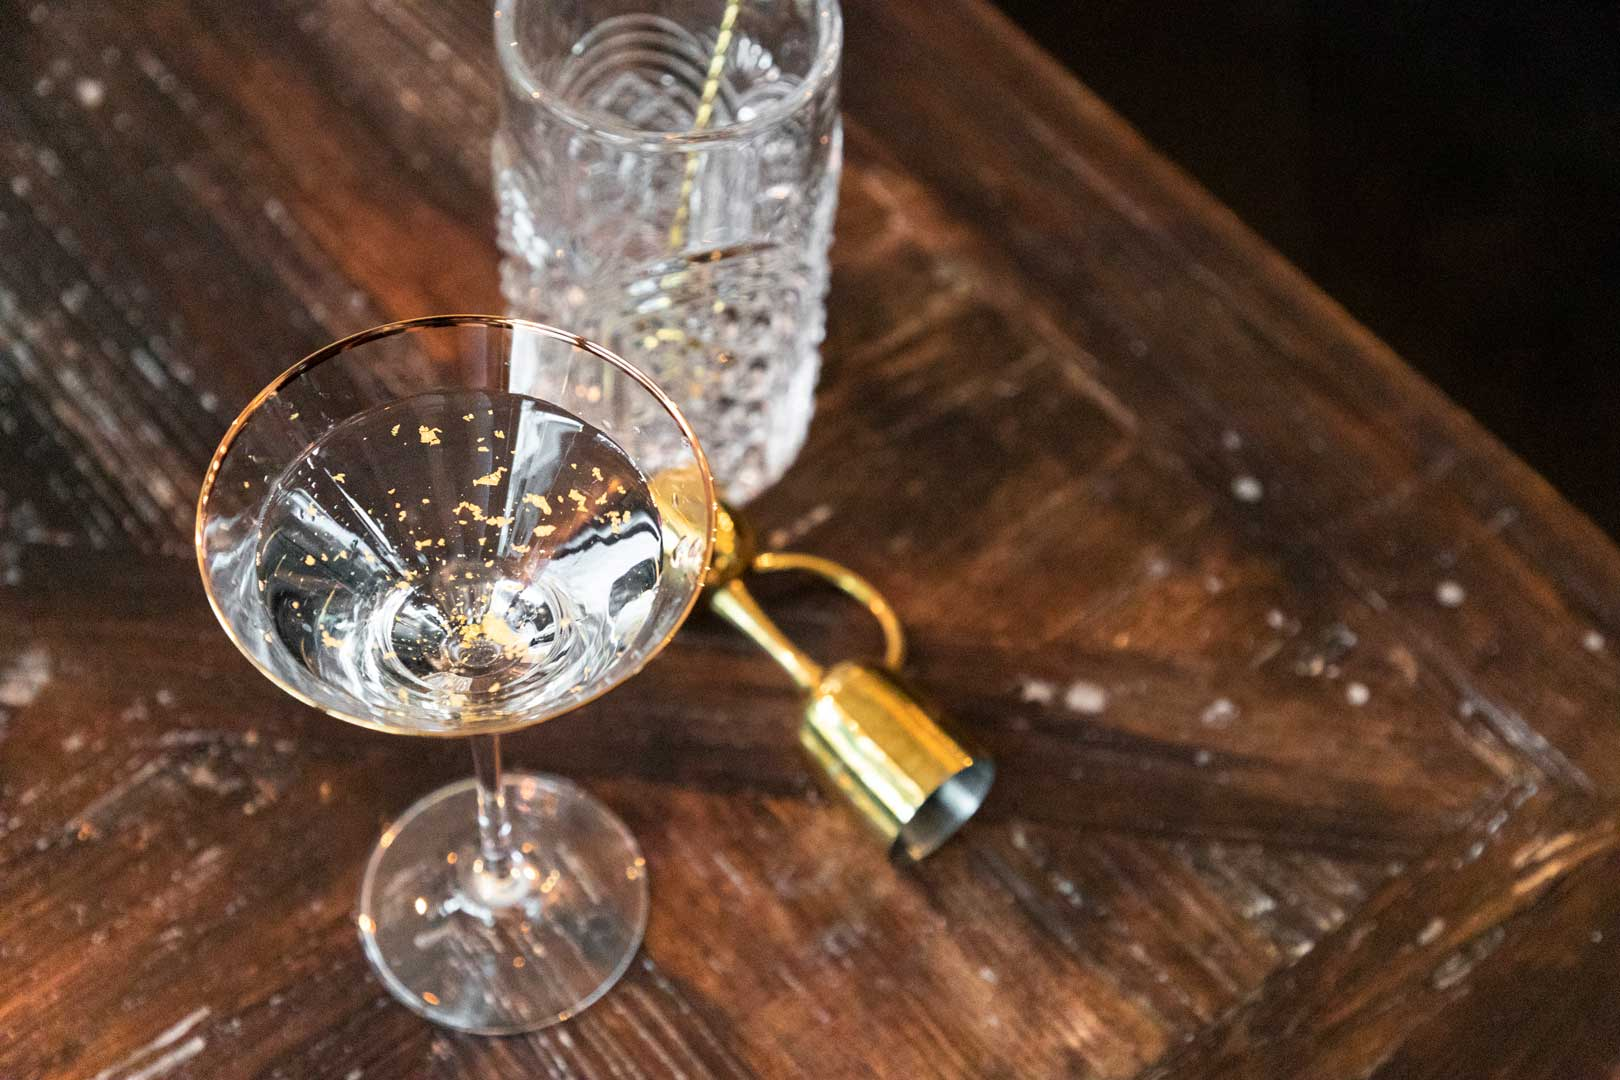 I 10 migliori cocktail bar in Porta Venezia - Kilburn